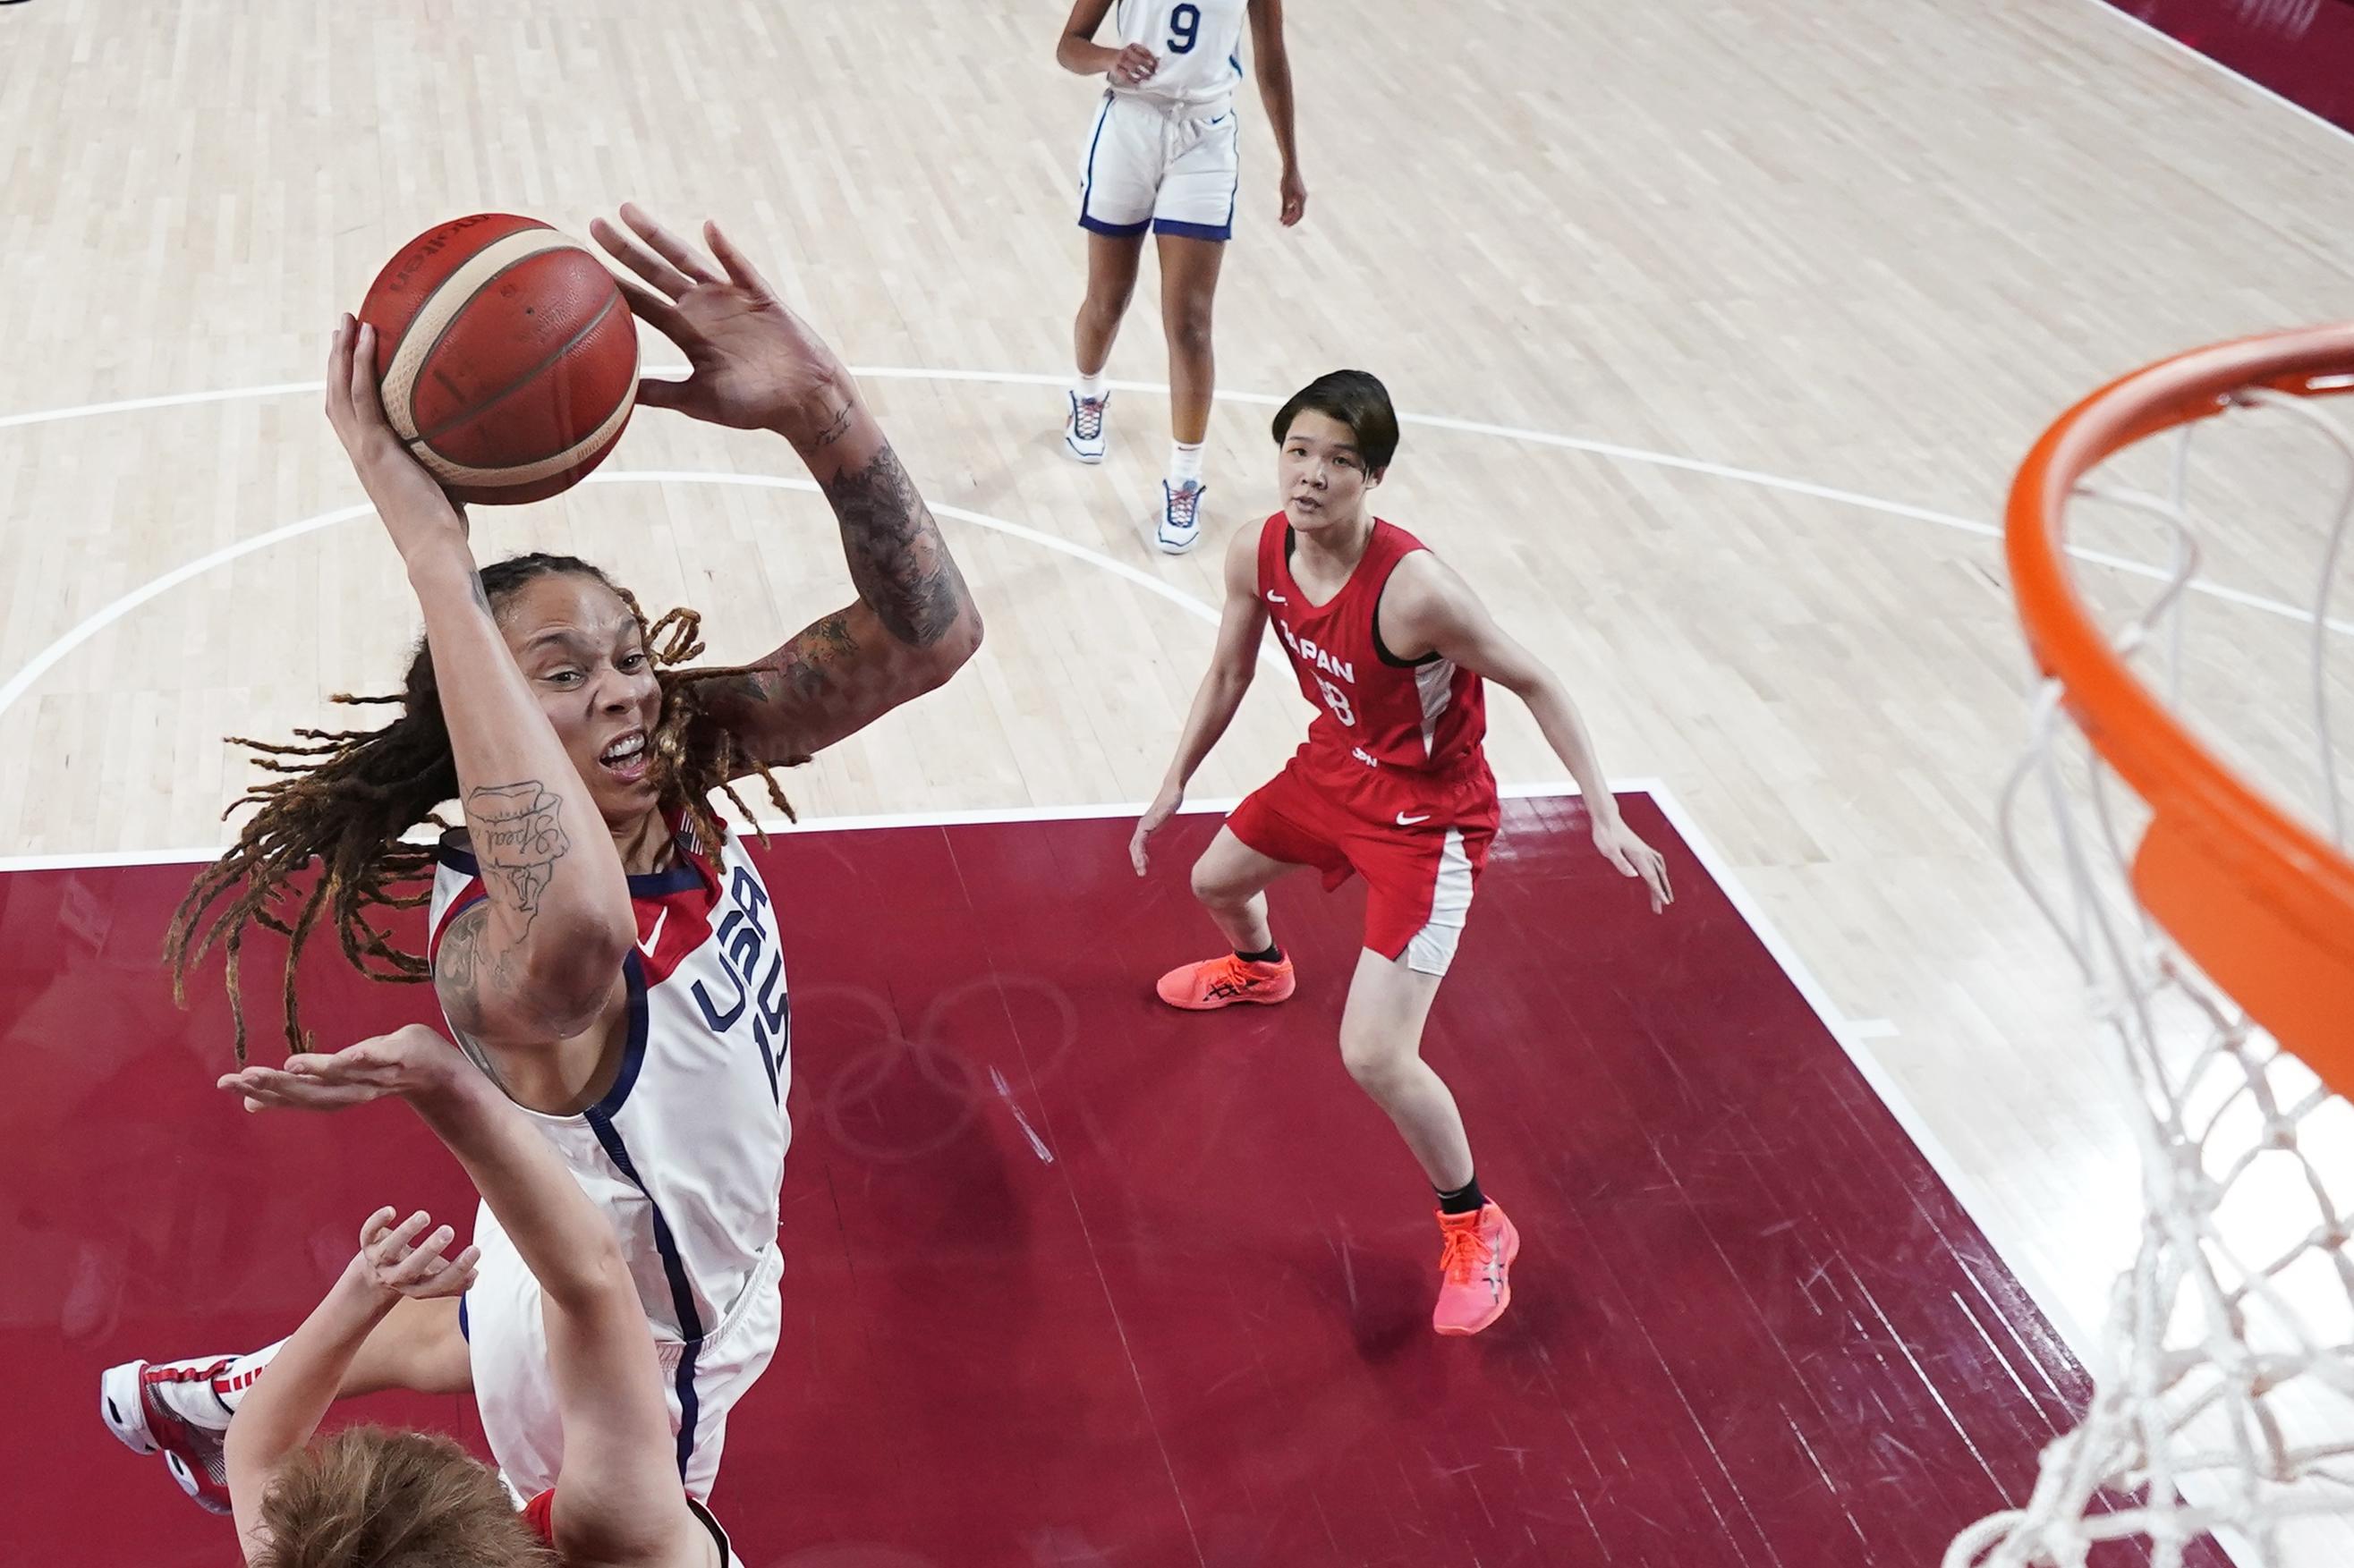 Tokyo 2020 Olympics - Basketball - Women - Group B - United States v Japan - Saitama Super Arena, Saitama, Japan - July 30, 2021. Brittney Griner of the United States in action at the rim Pool via REUTERS/Charlie Neibergall